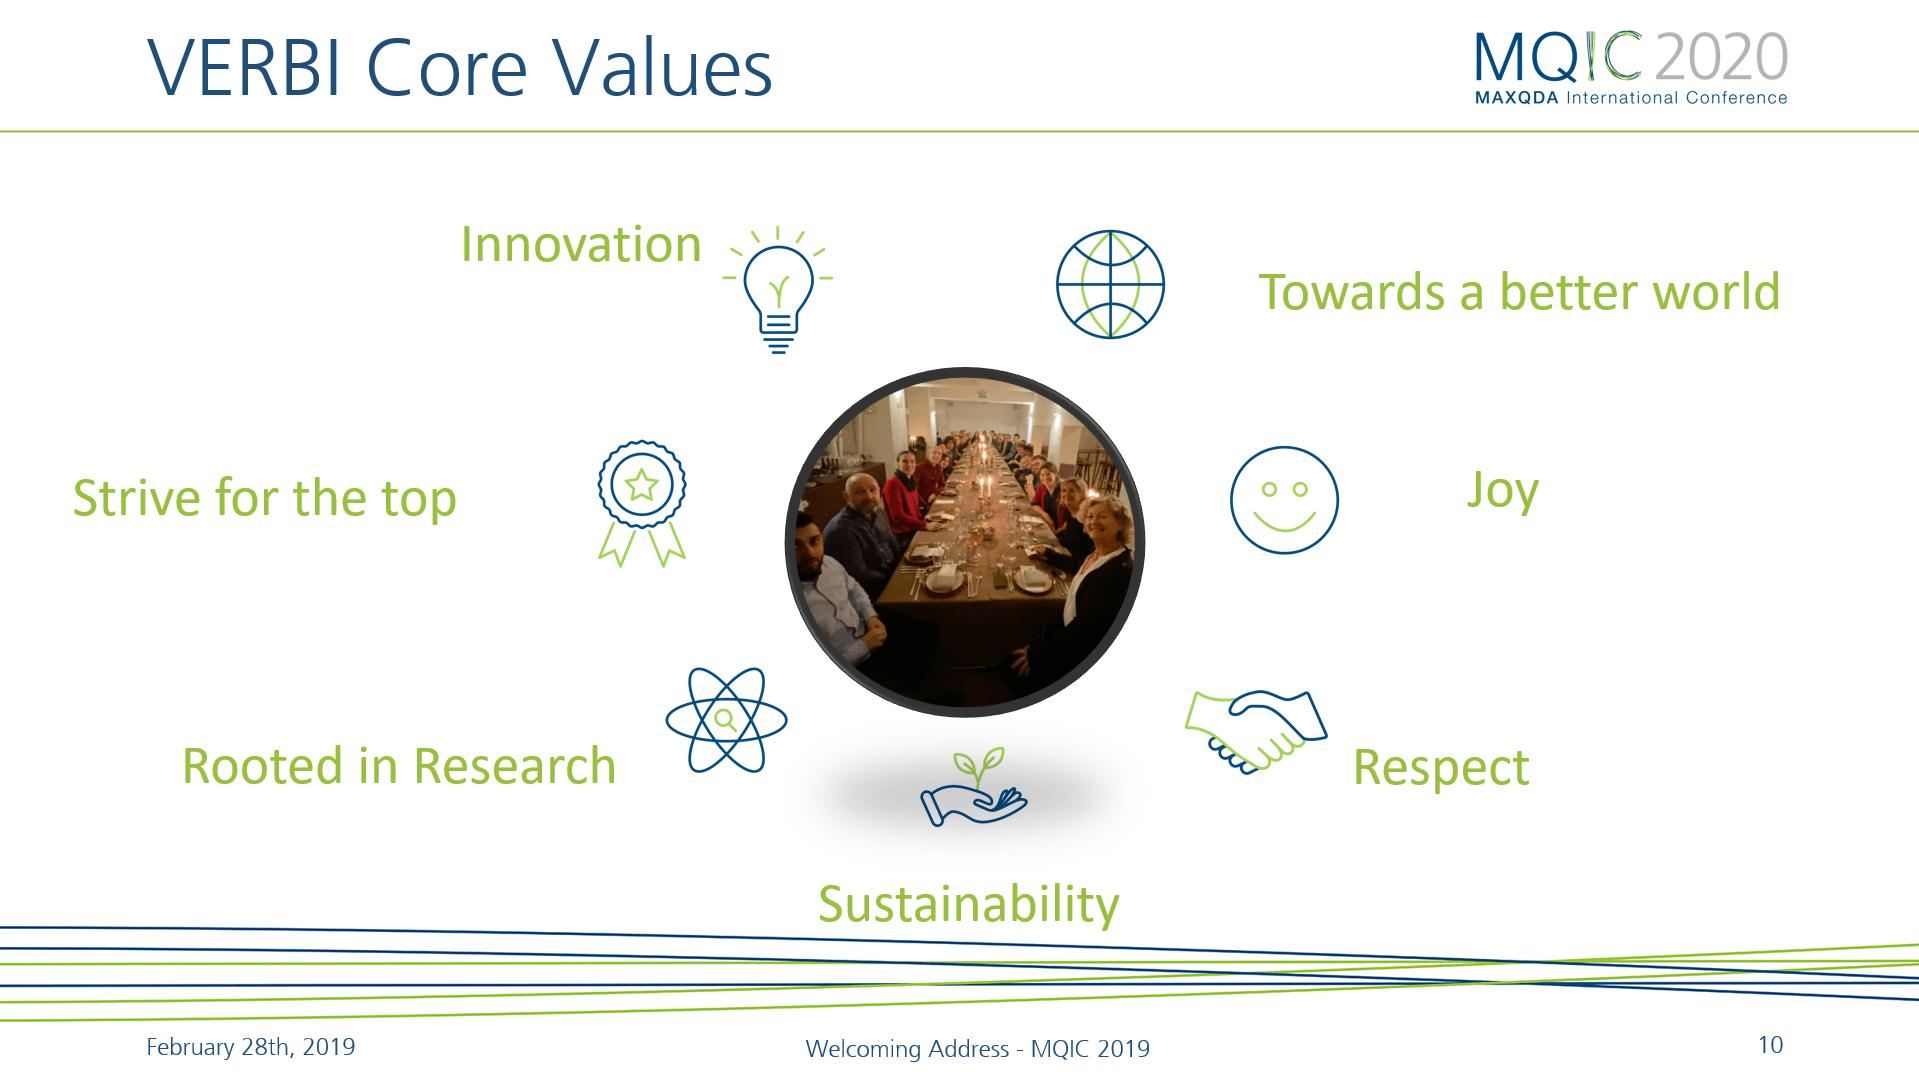 VERBI Software's Core Company Values